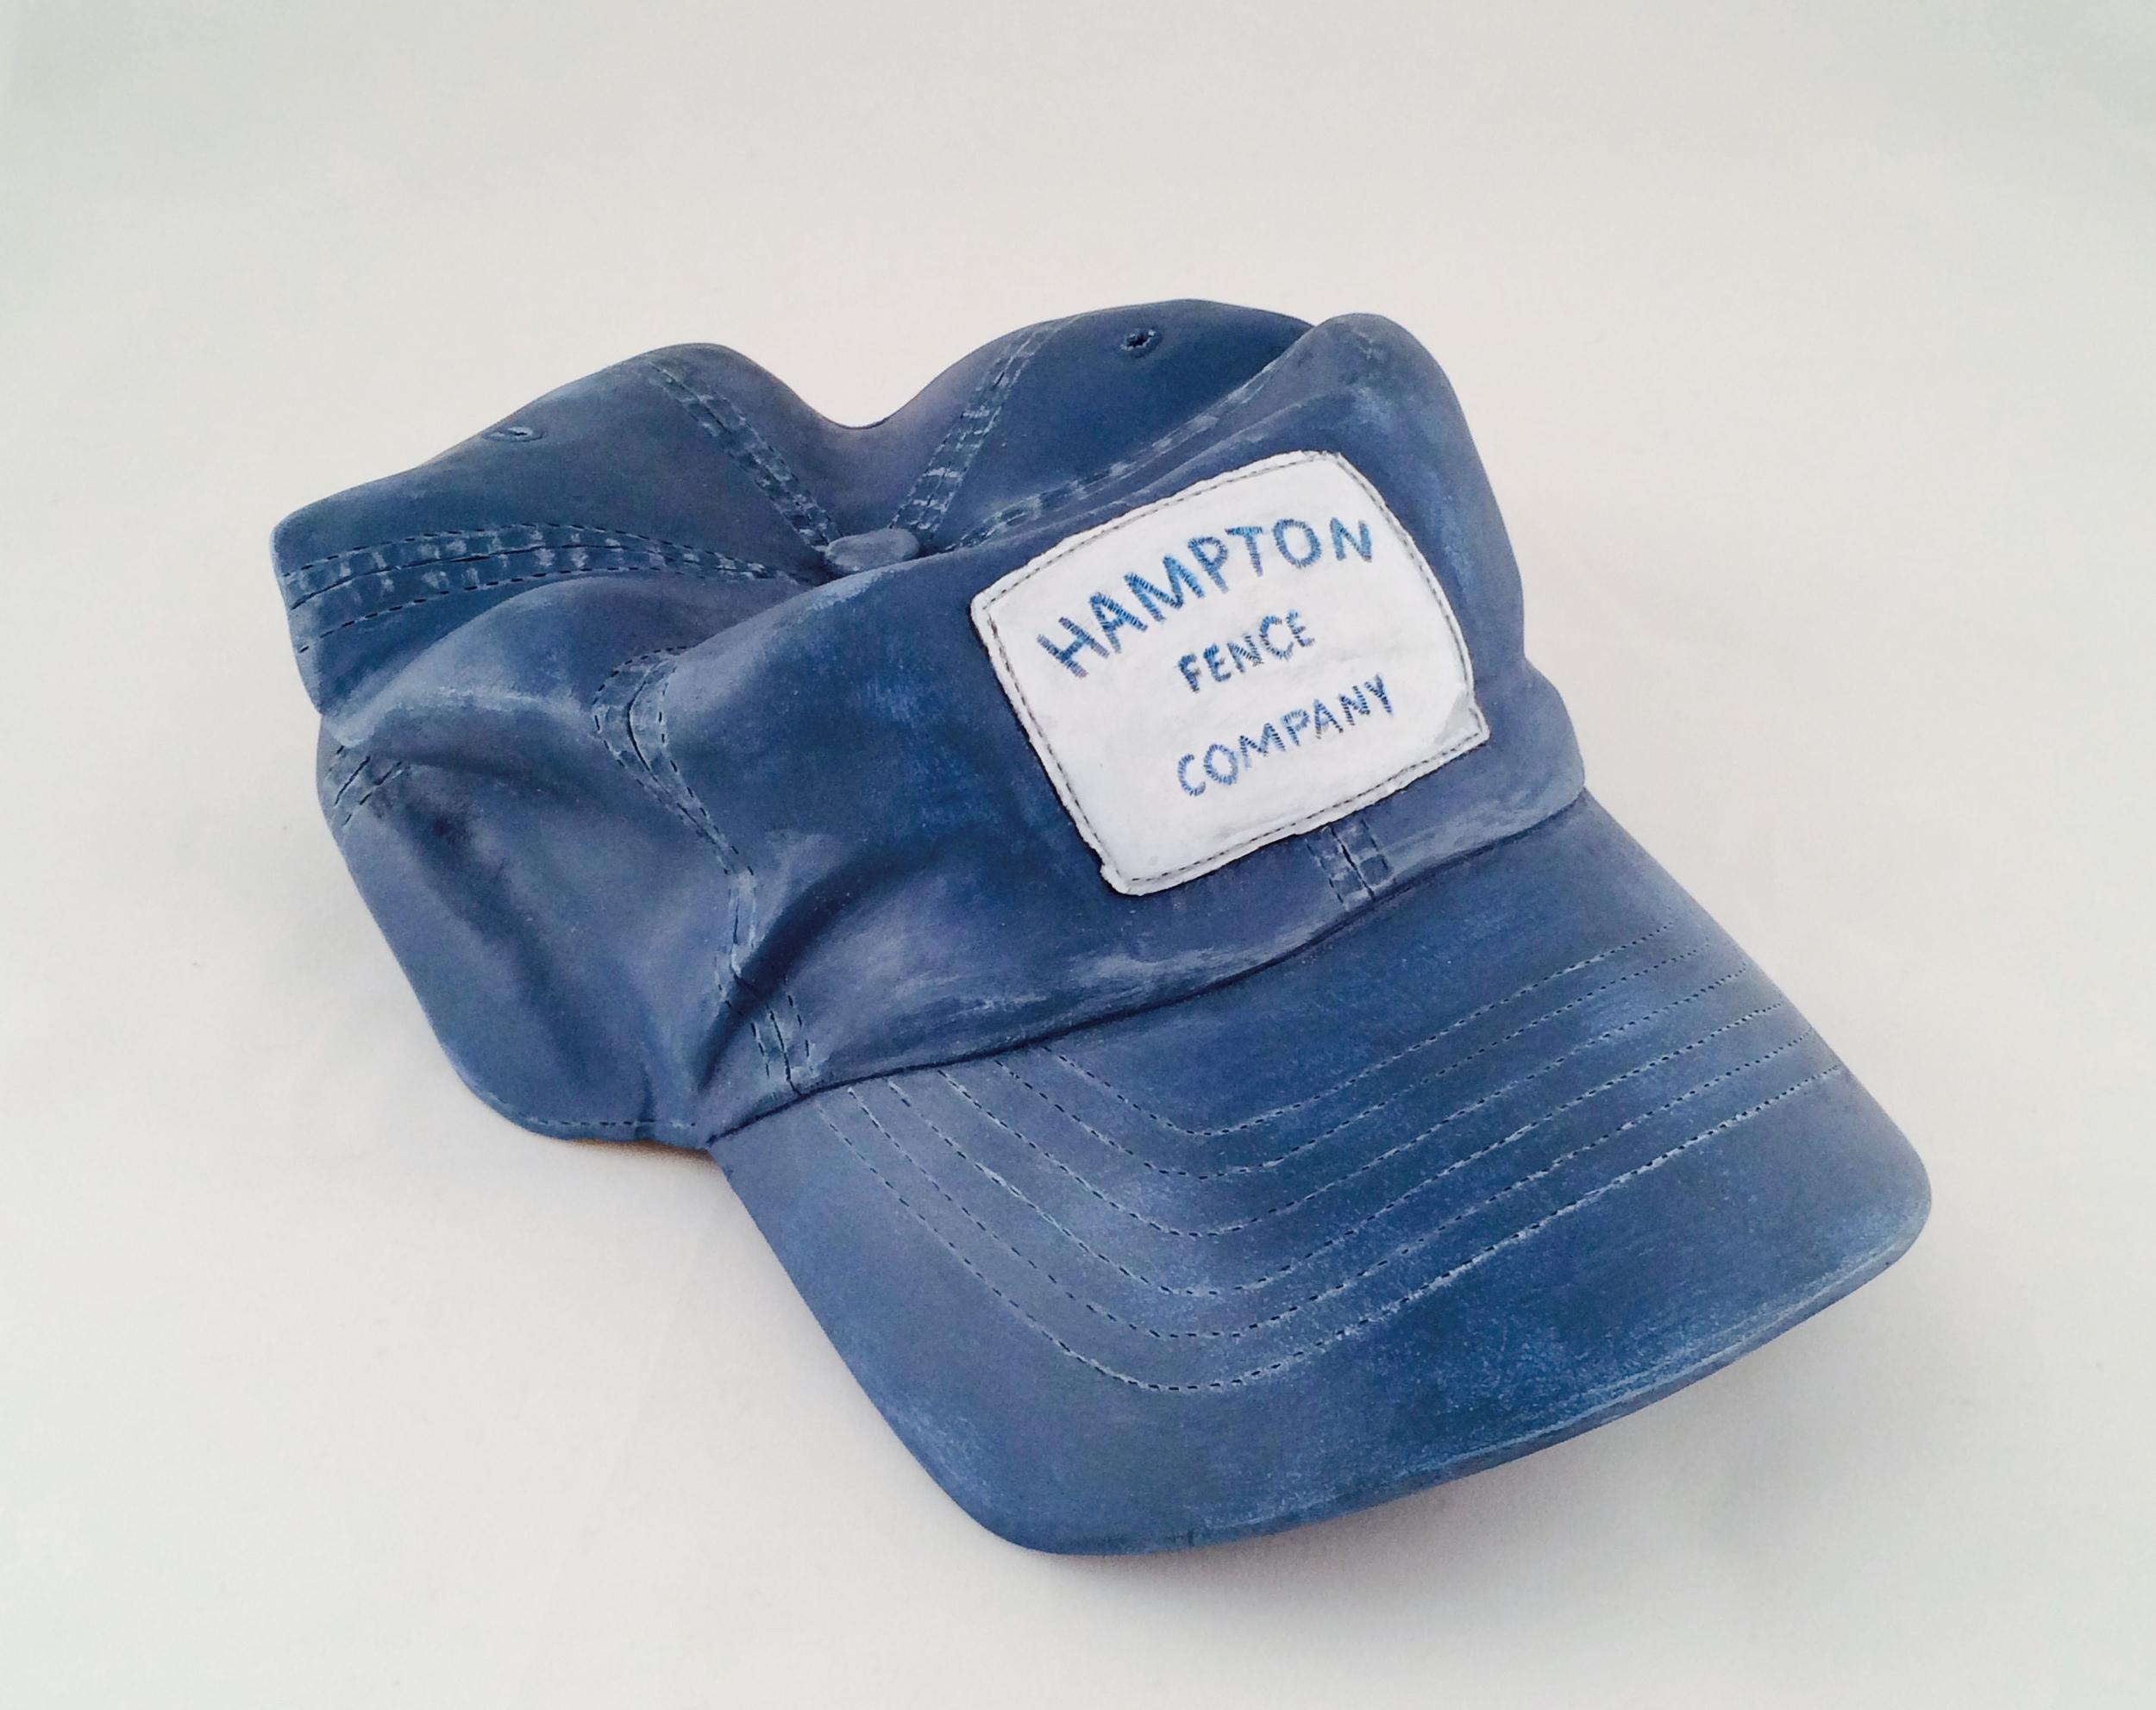 Hampton Fence Company